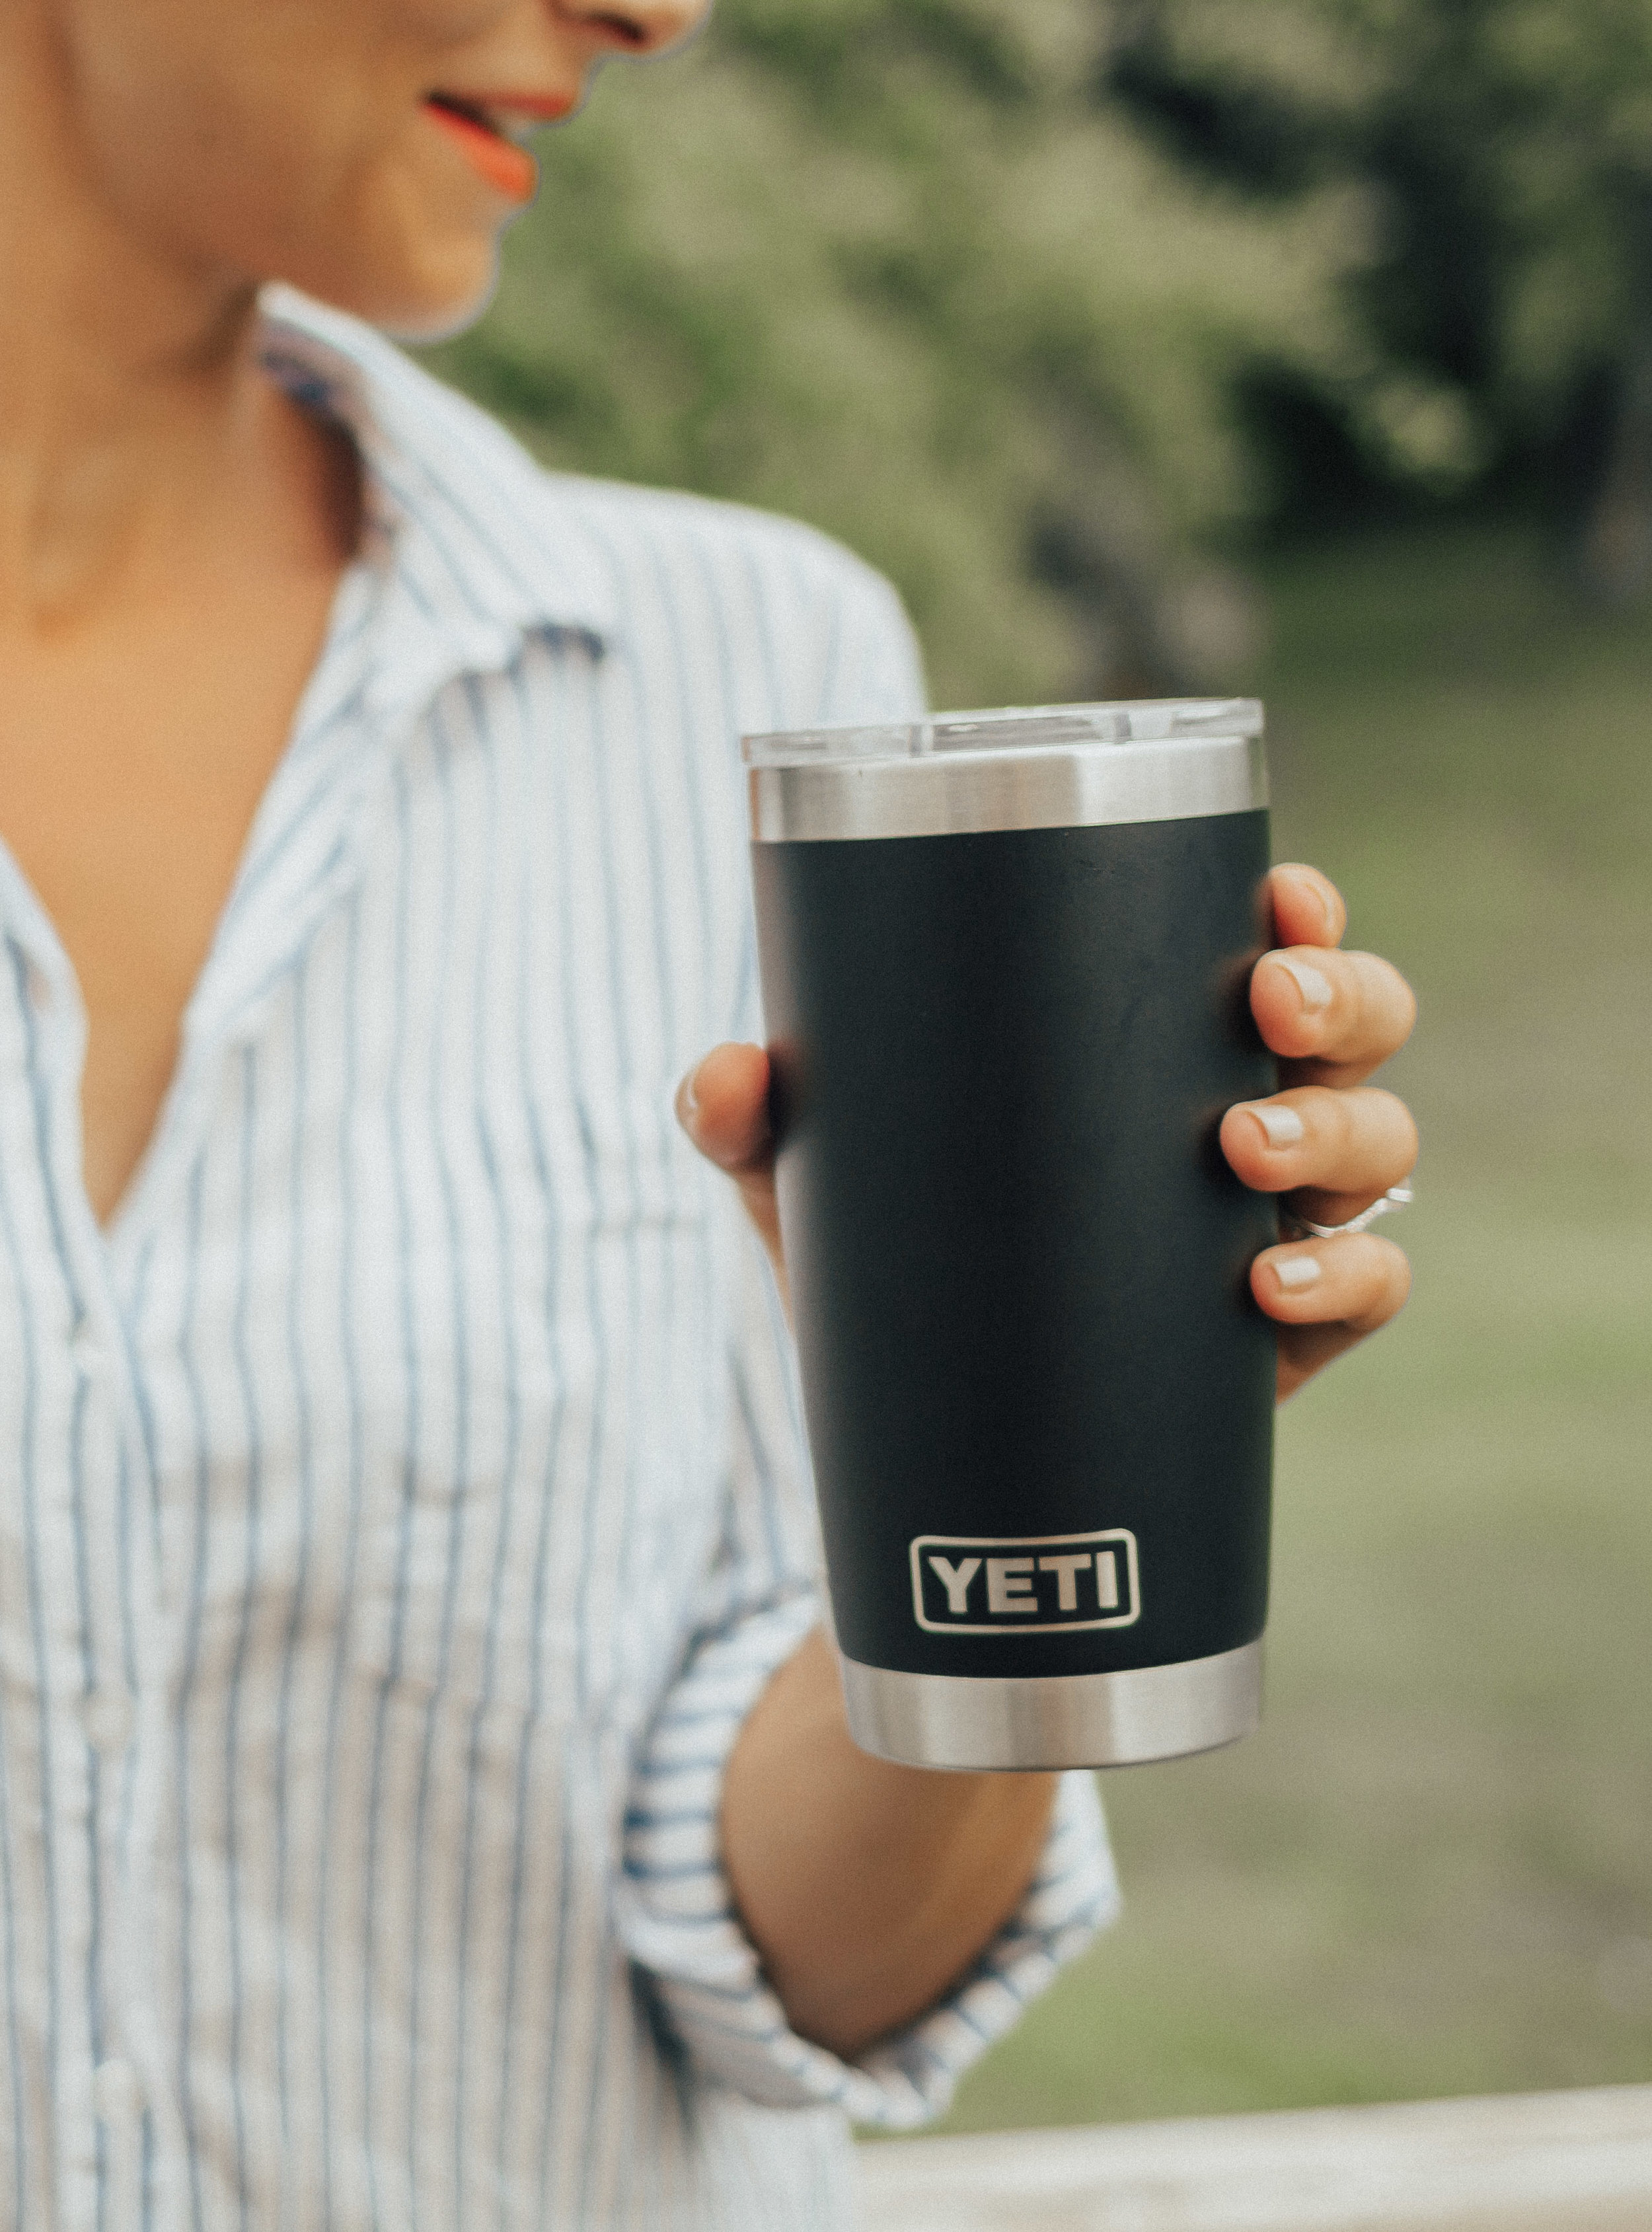 Yeti – Yeti Tumblers – Yeti Rambler Tumblers – Reusable Straws – Reduce Reuse Recycle – Yeti Cups #yeti #heartandseam  www.heartandseam.com